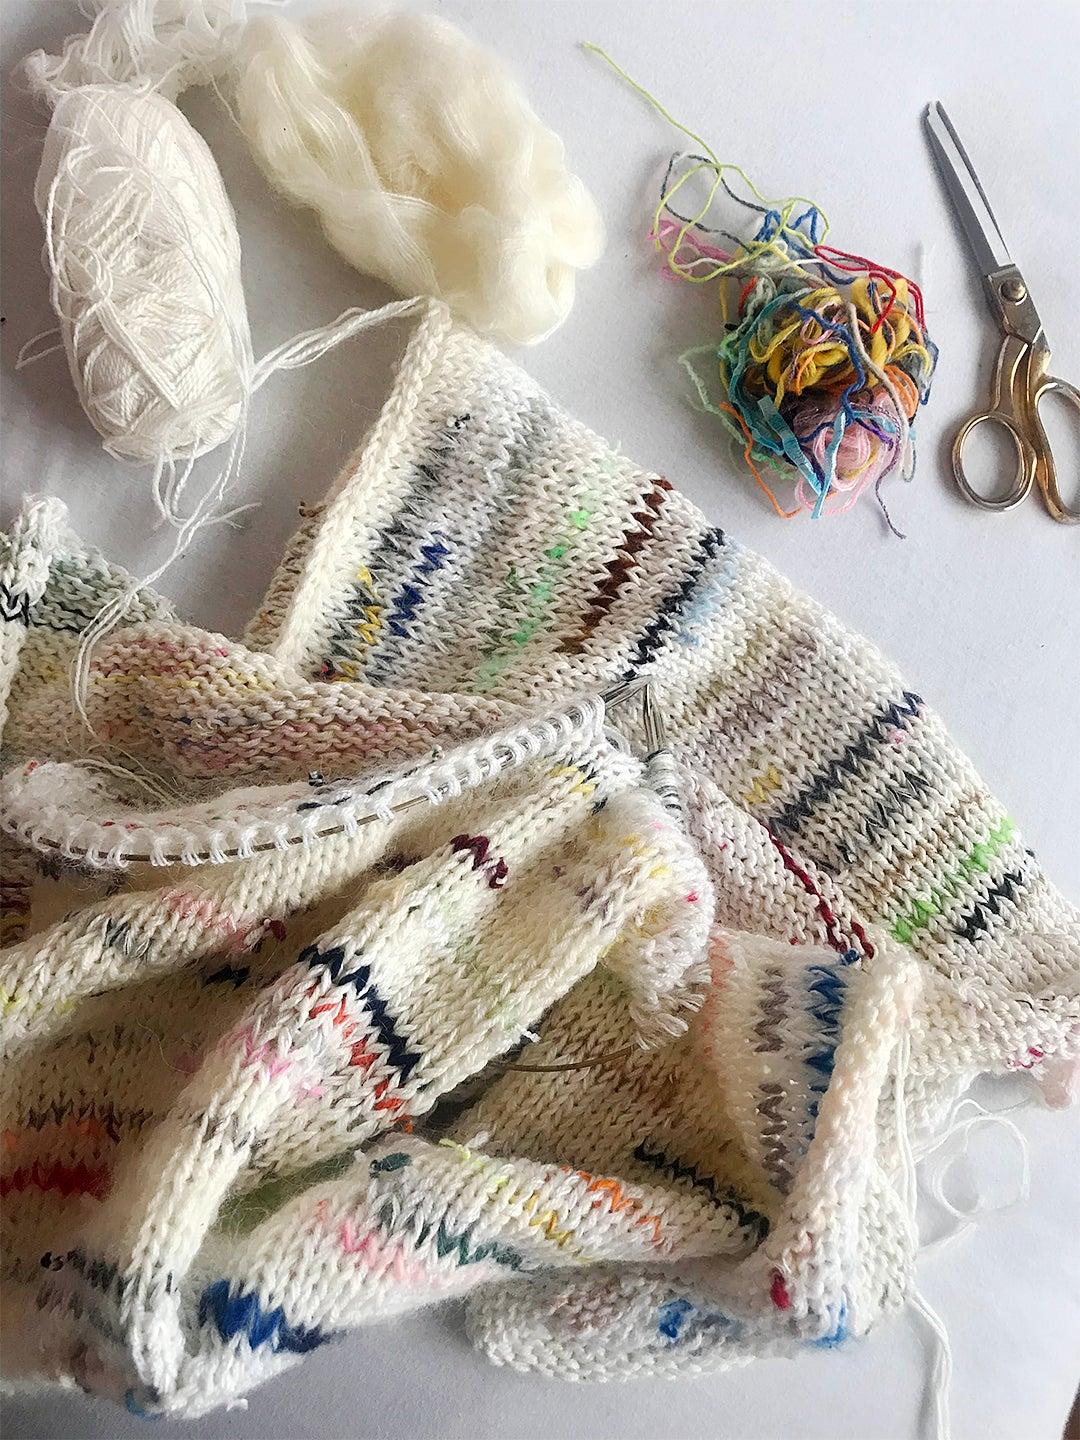 Sweater in process